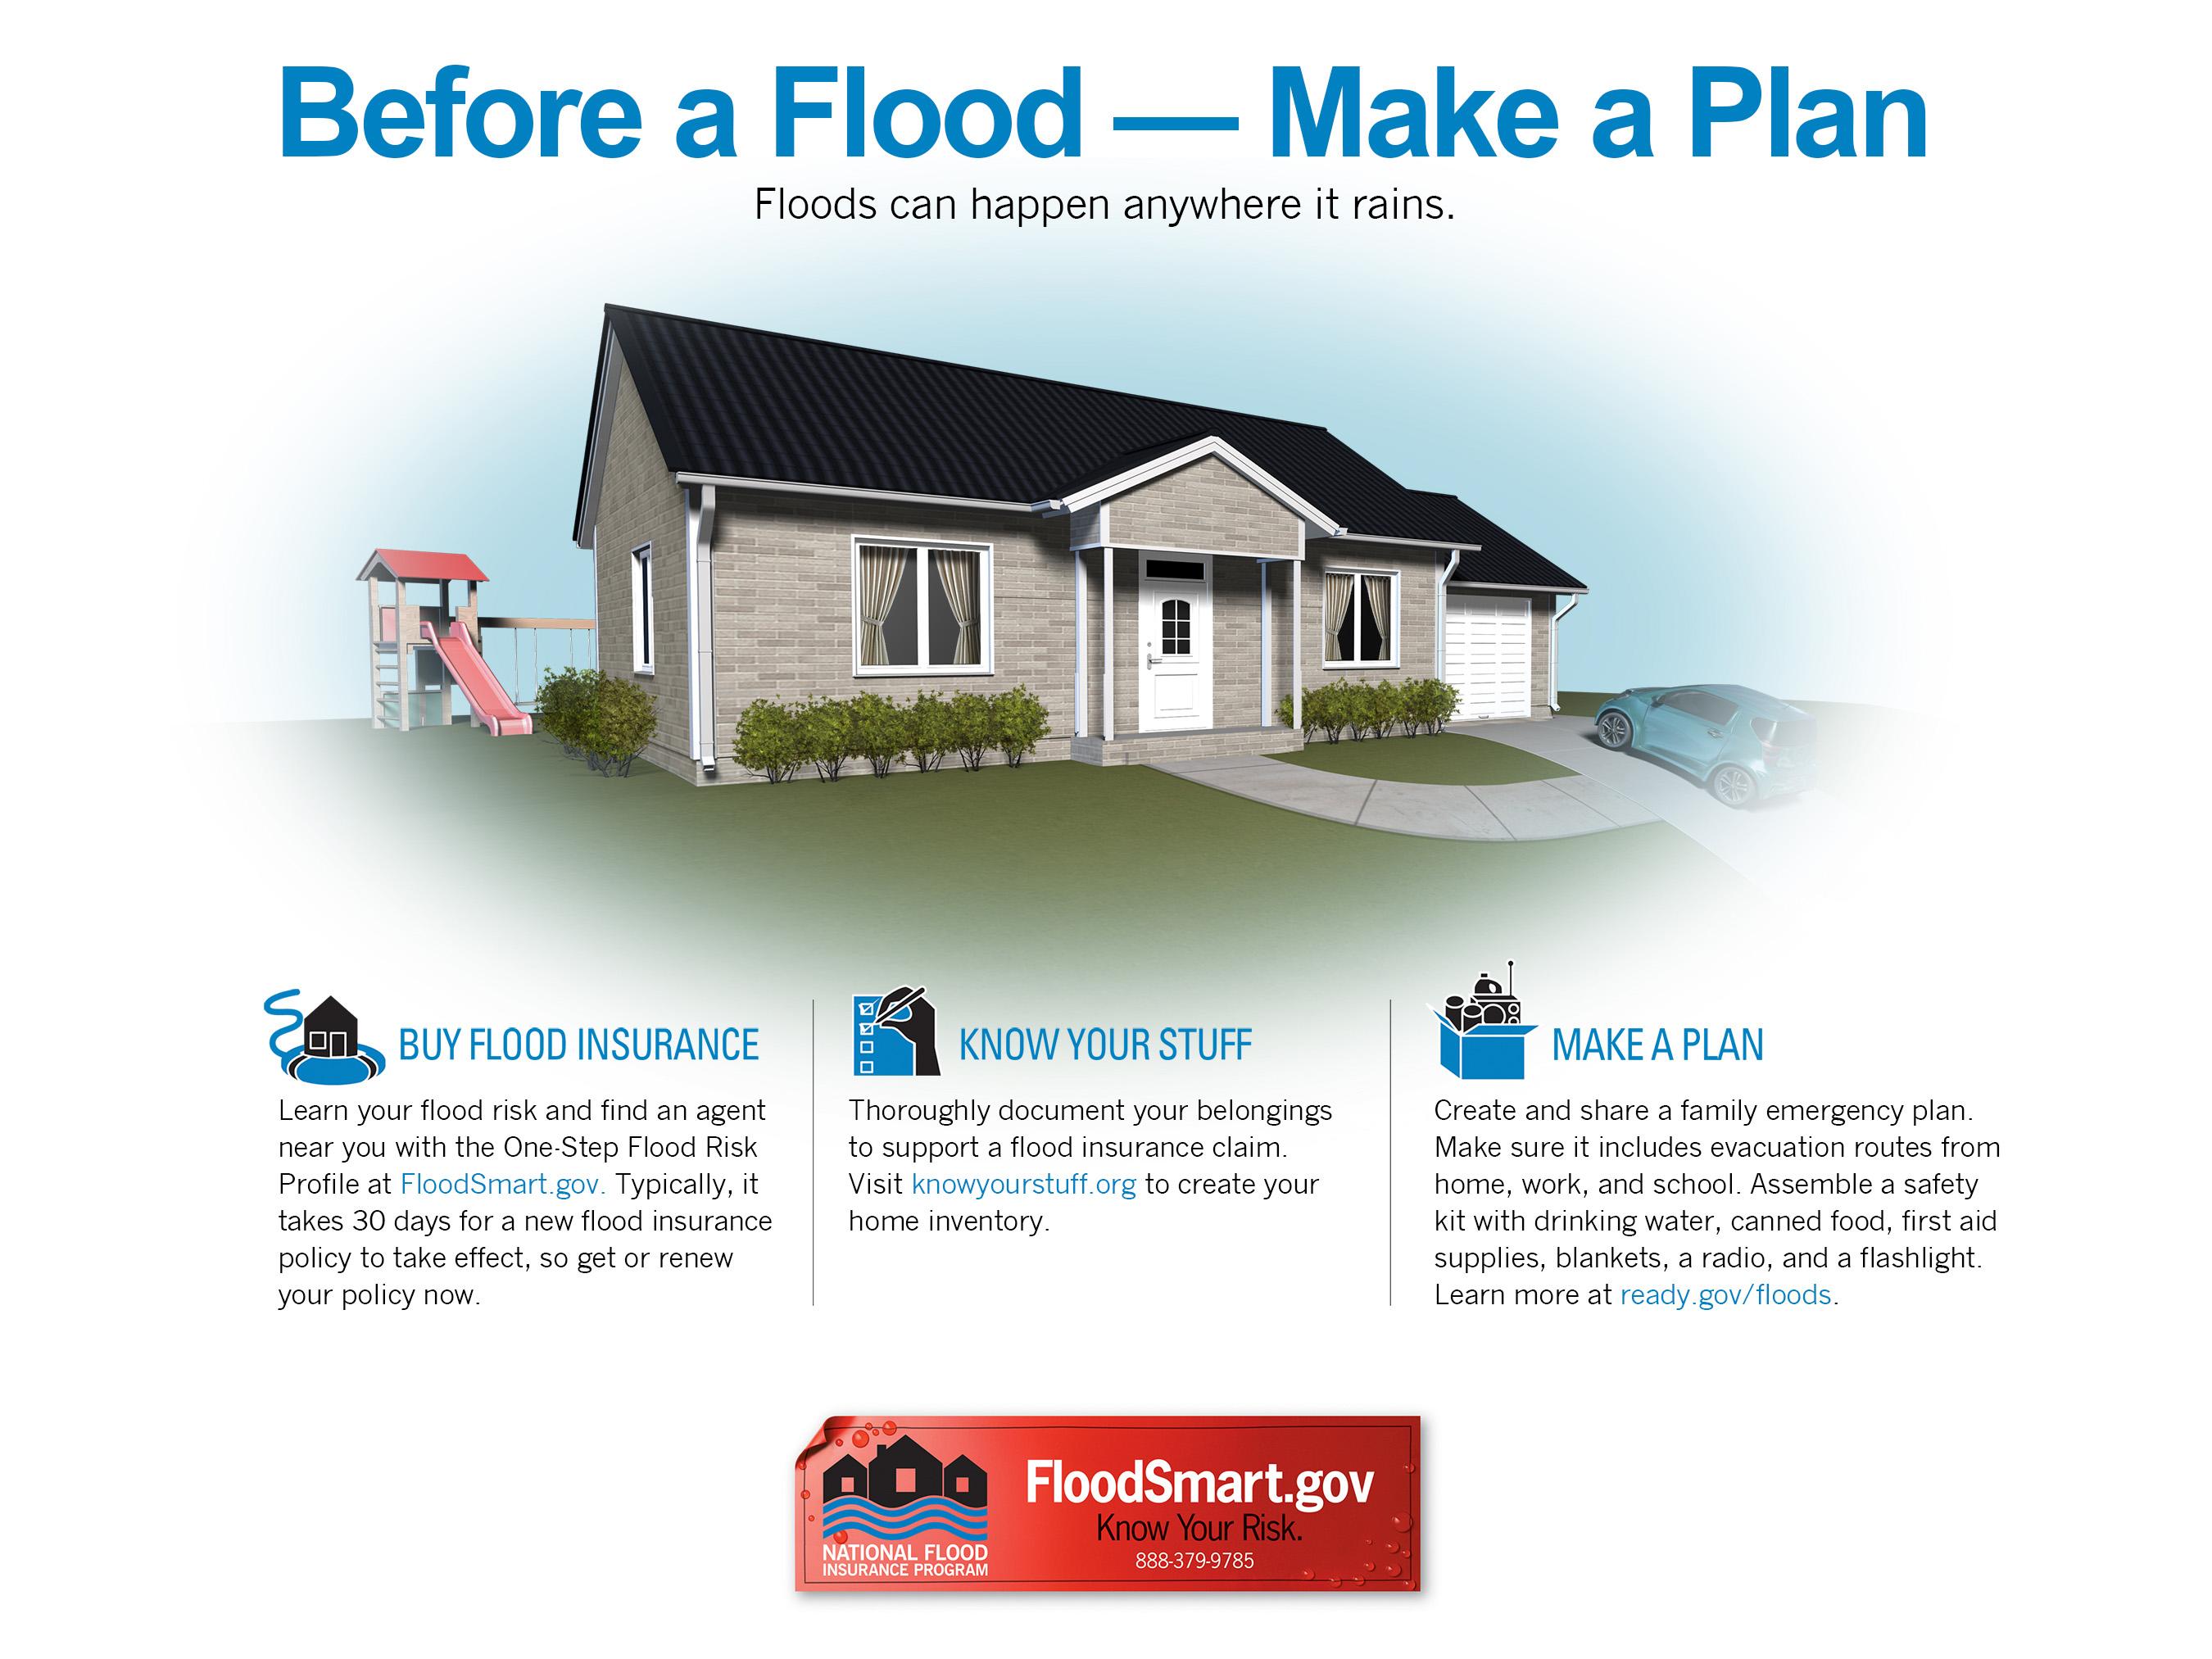 http://www.multivu.com/players/English/7338651-iii-weather-flood-insurance/gallery/image/059af342-88e6-40ac-9e50-46f47117c58d.HR.jpg